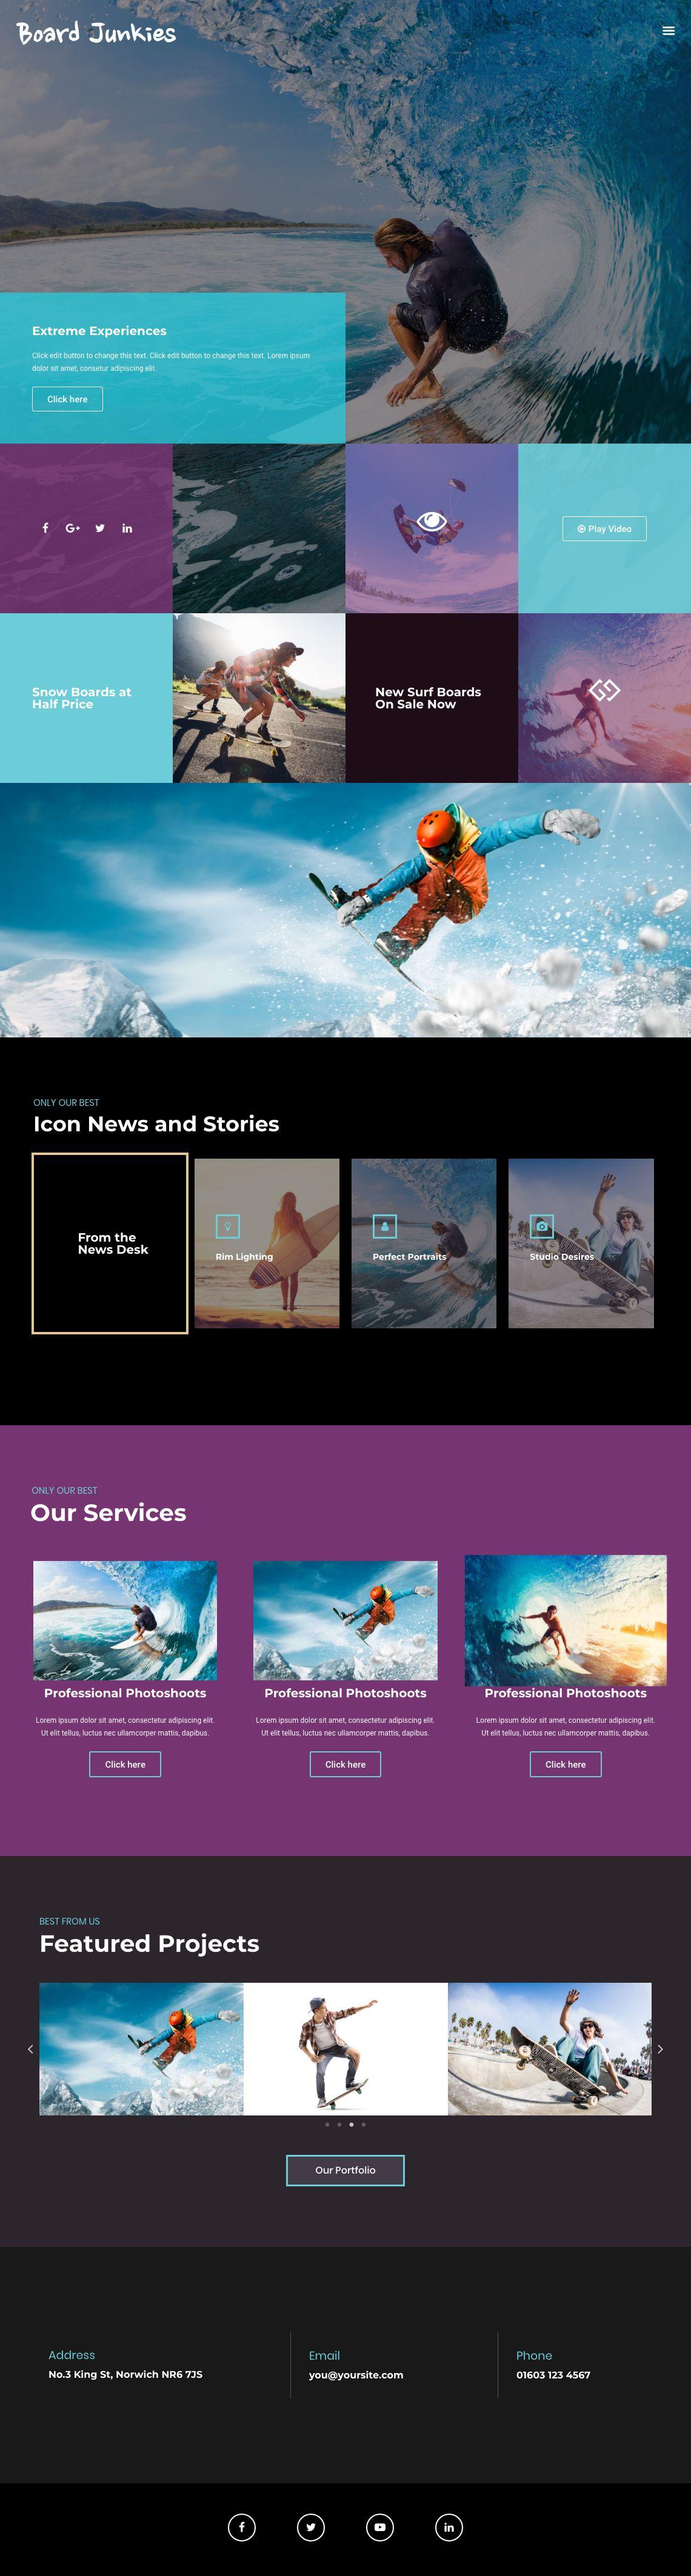 Web And App Design Website For Surfing Shop Home Page Template Conceptual Wordpress Website Paginas Web Creativas Surf Pagina Web